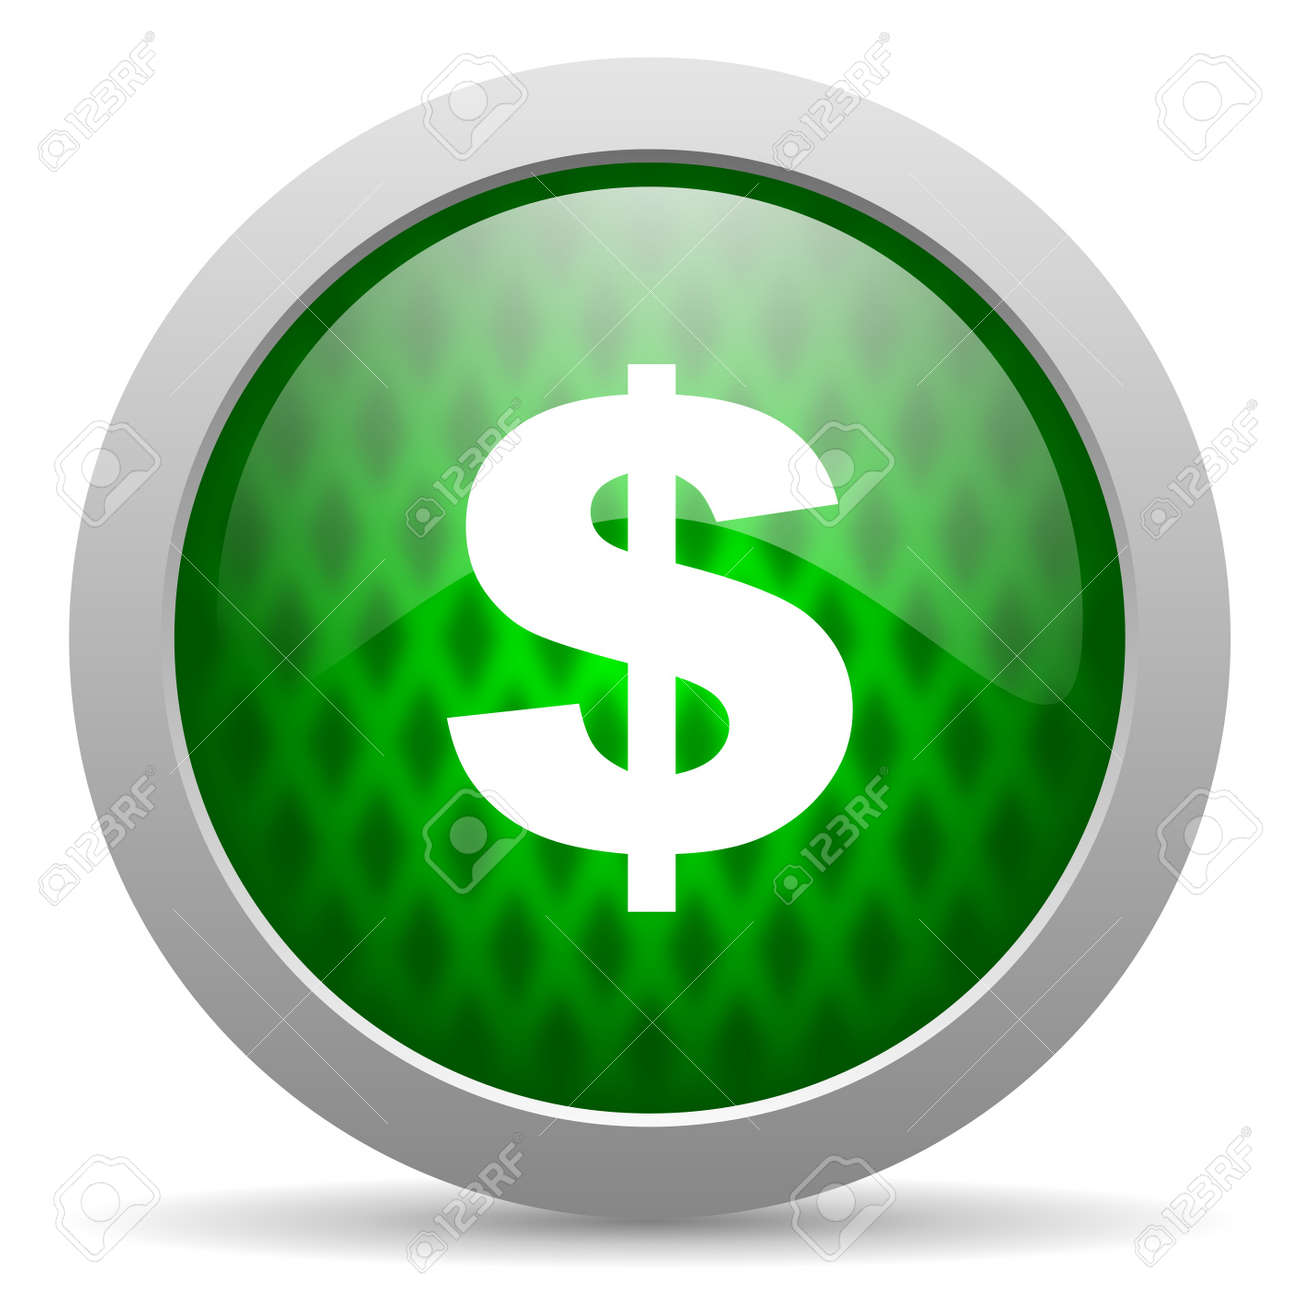 us dollar icon Stock Photo - 15417098